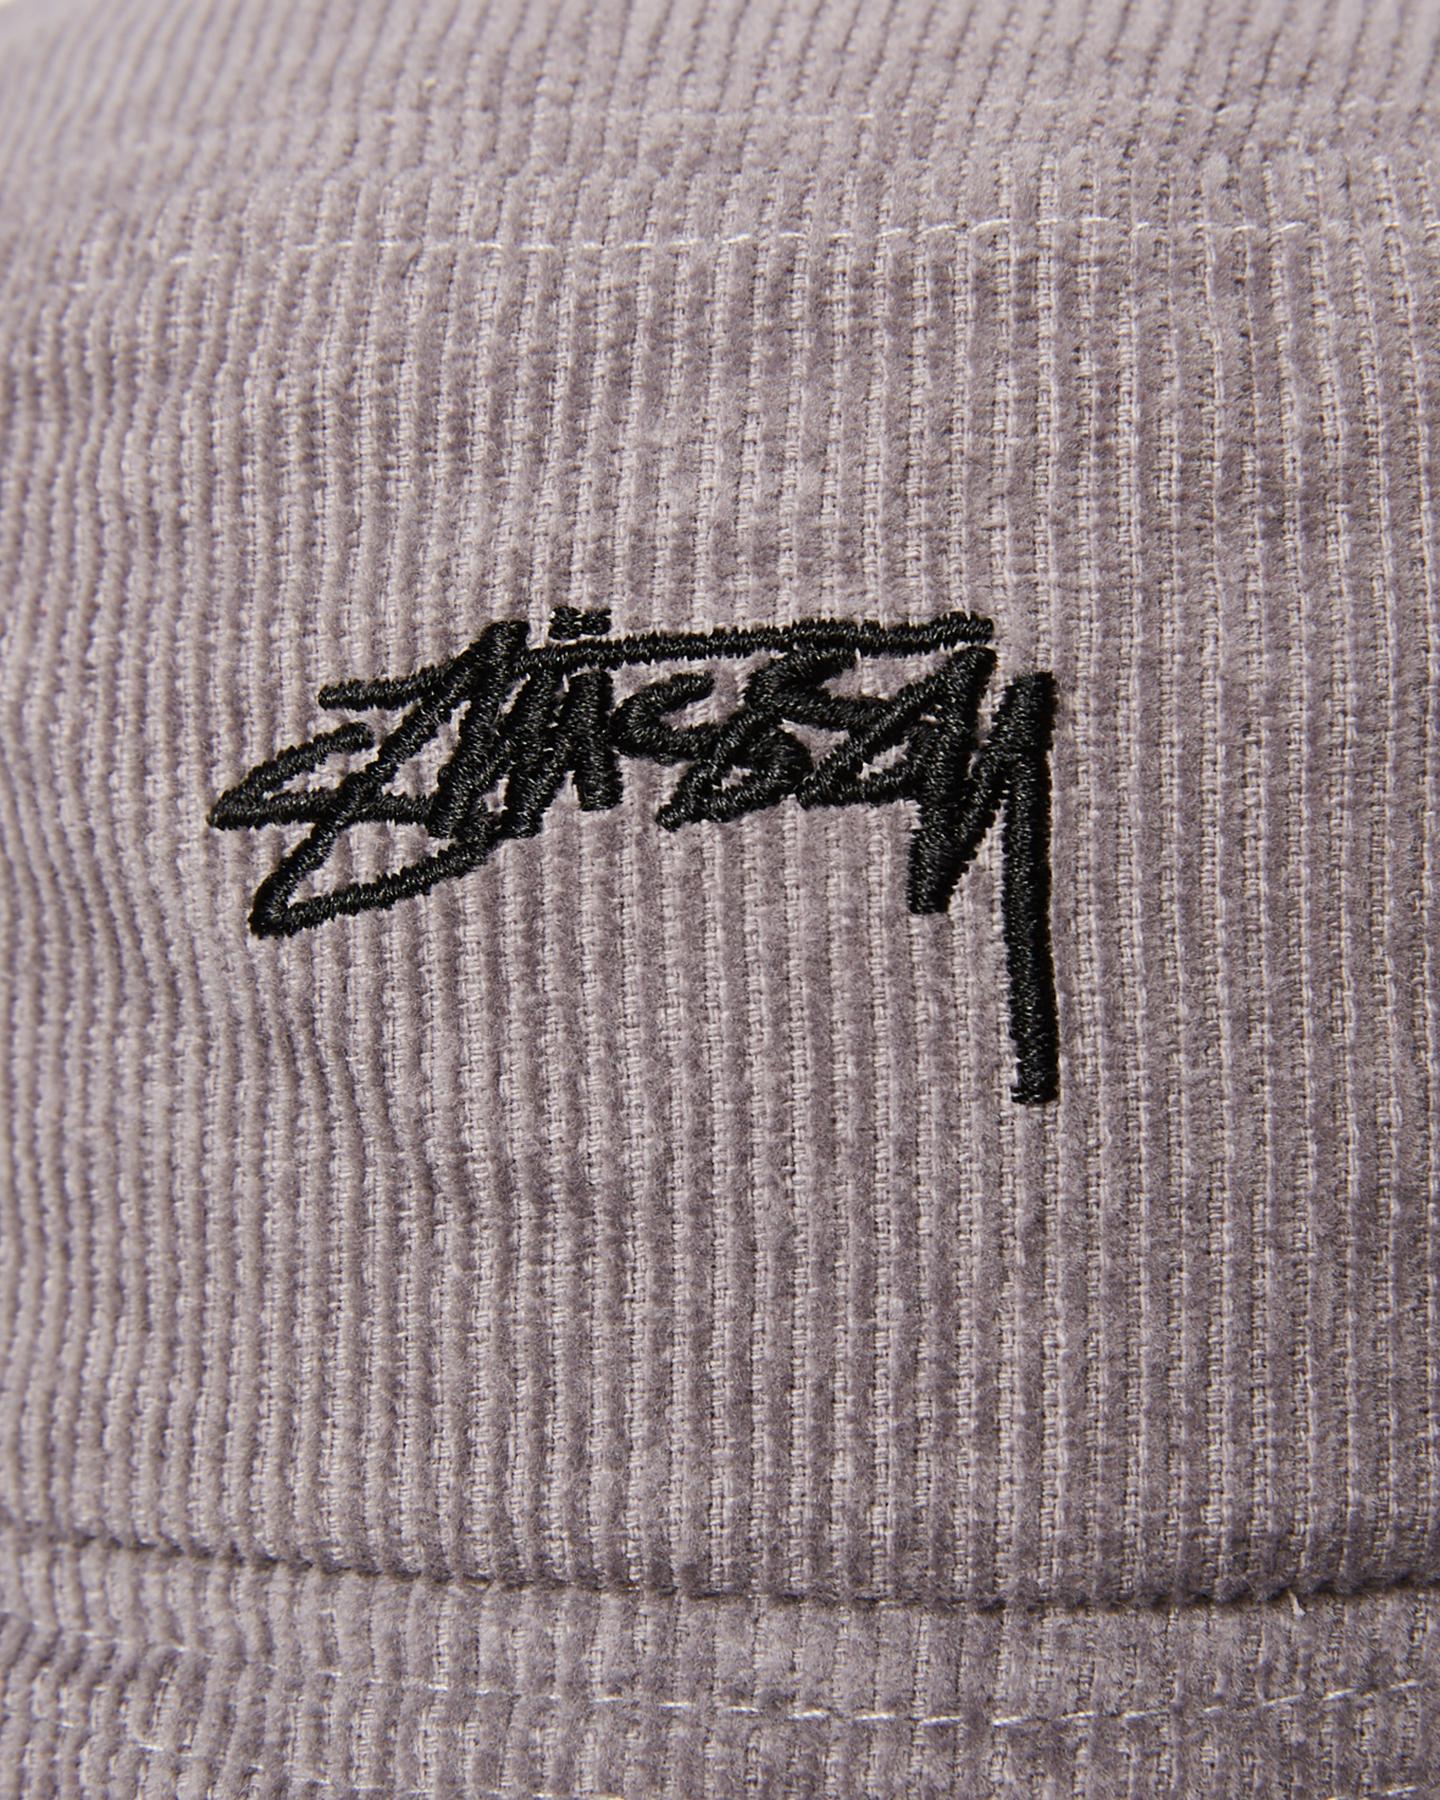 d11a8d616 Details about New Stussy Men's Authentic Cord Bucket Hat Cotton Soft  Corduroy Red